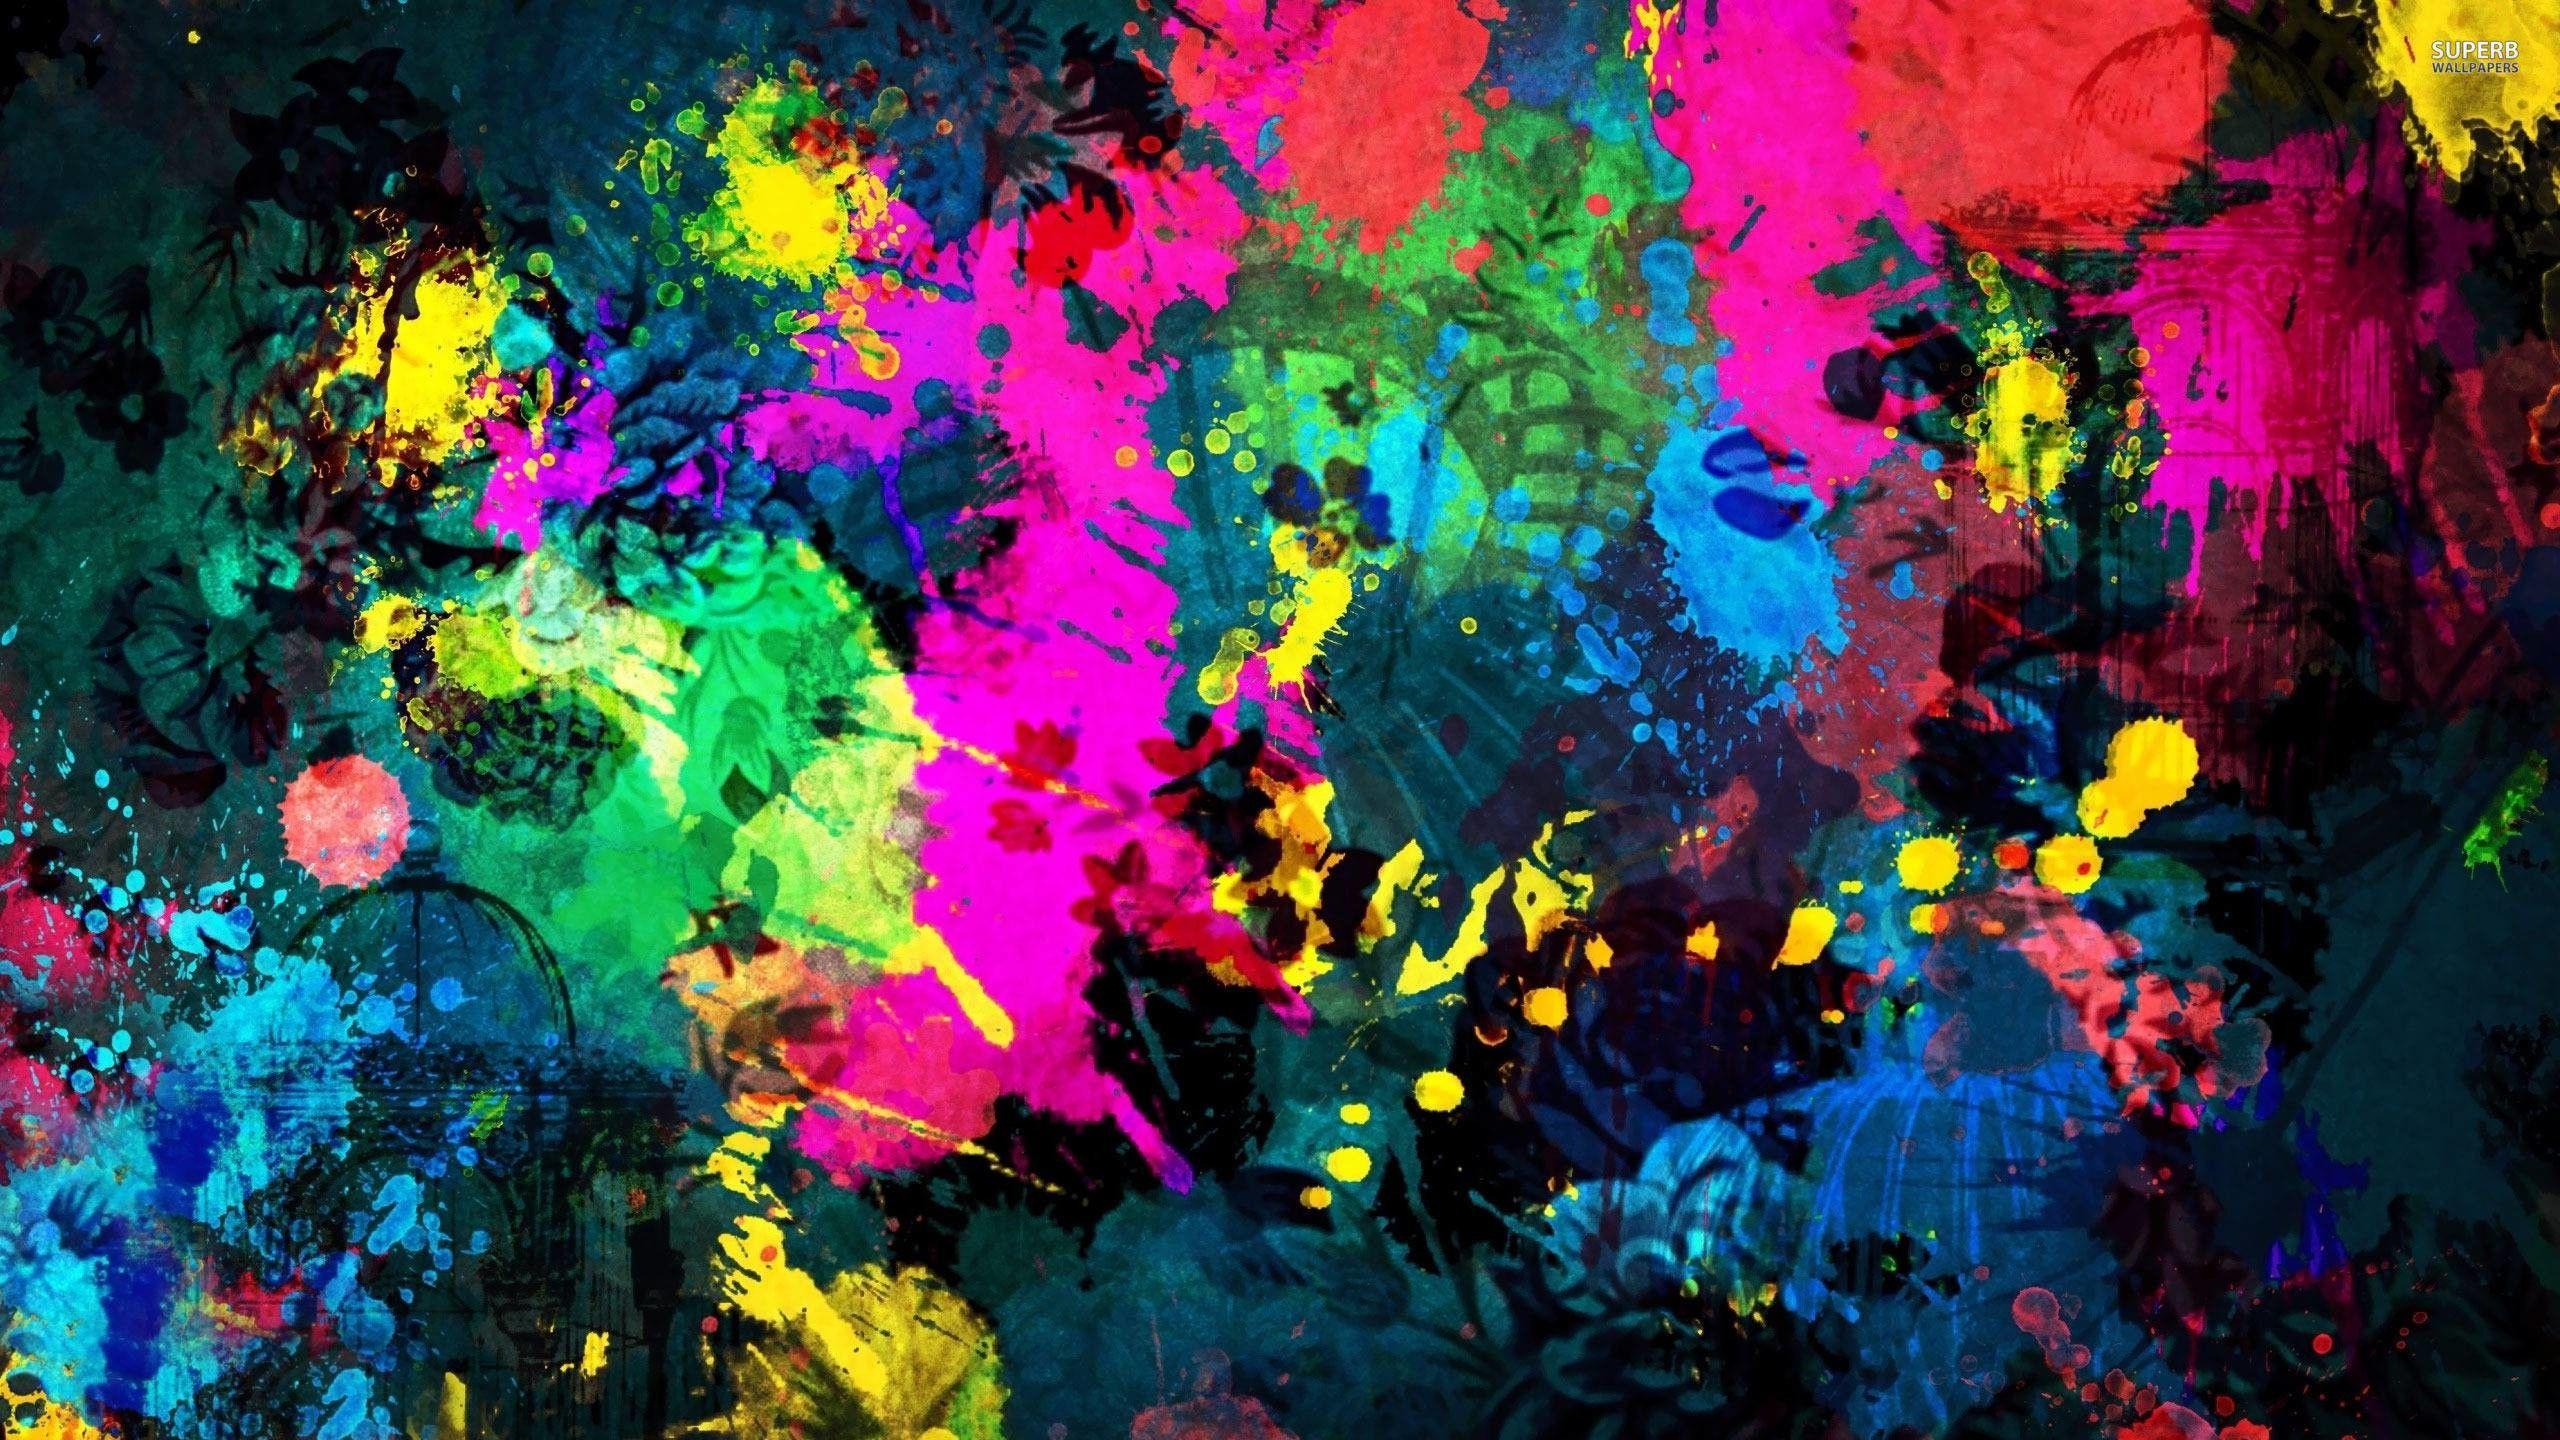 How To Splatter Paint Walls Paint Platter Paint Splatter Art Splatter Art Drip Painting